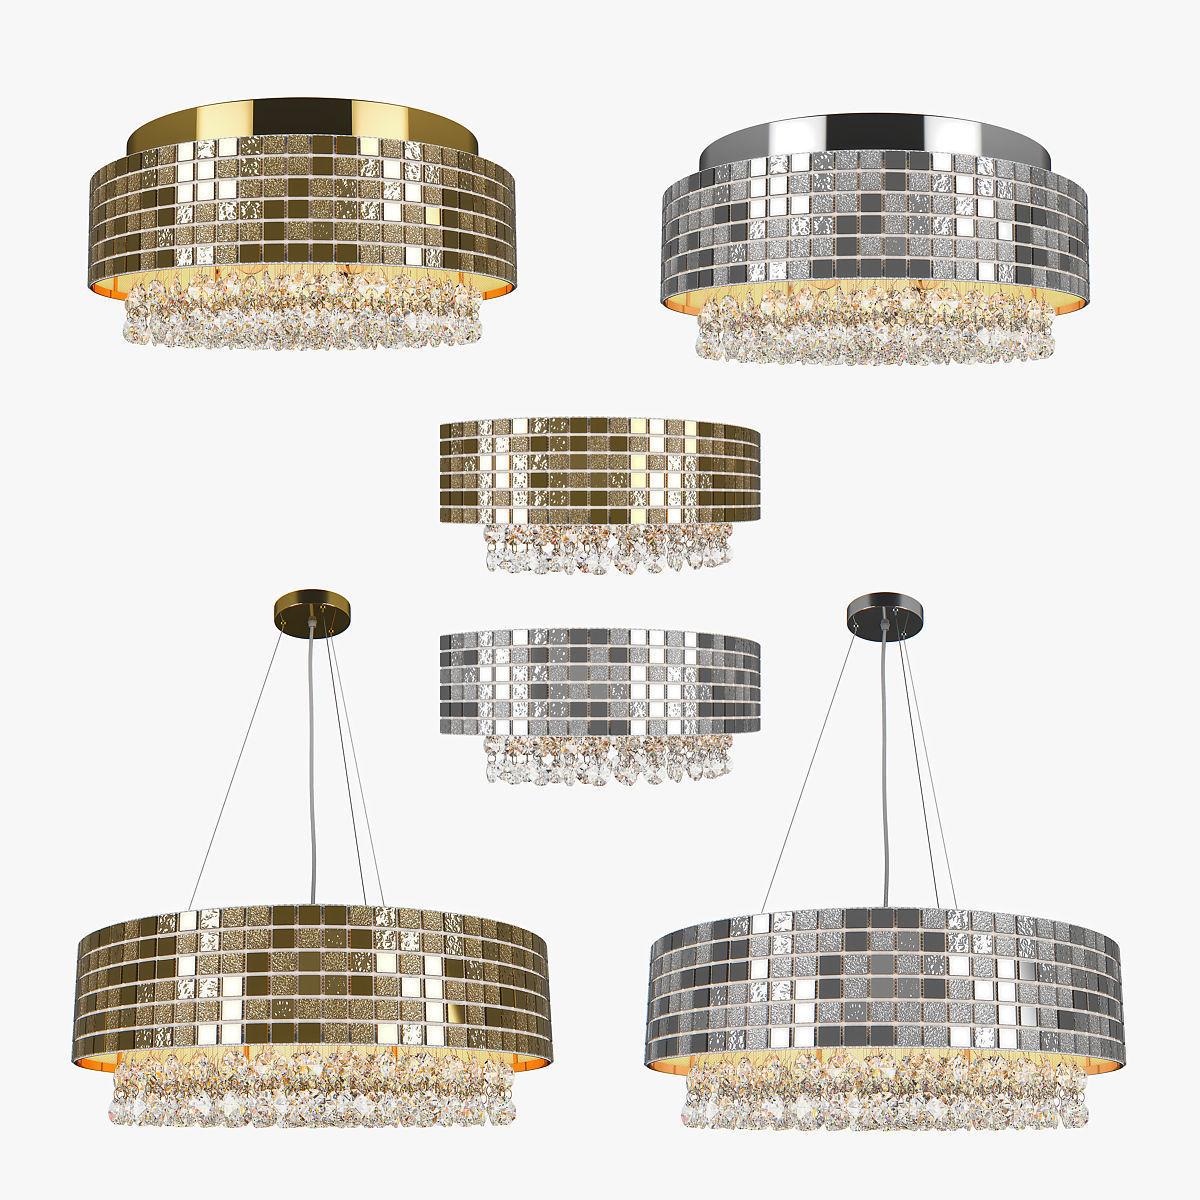 743 Bezazz Lightstar Collection